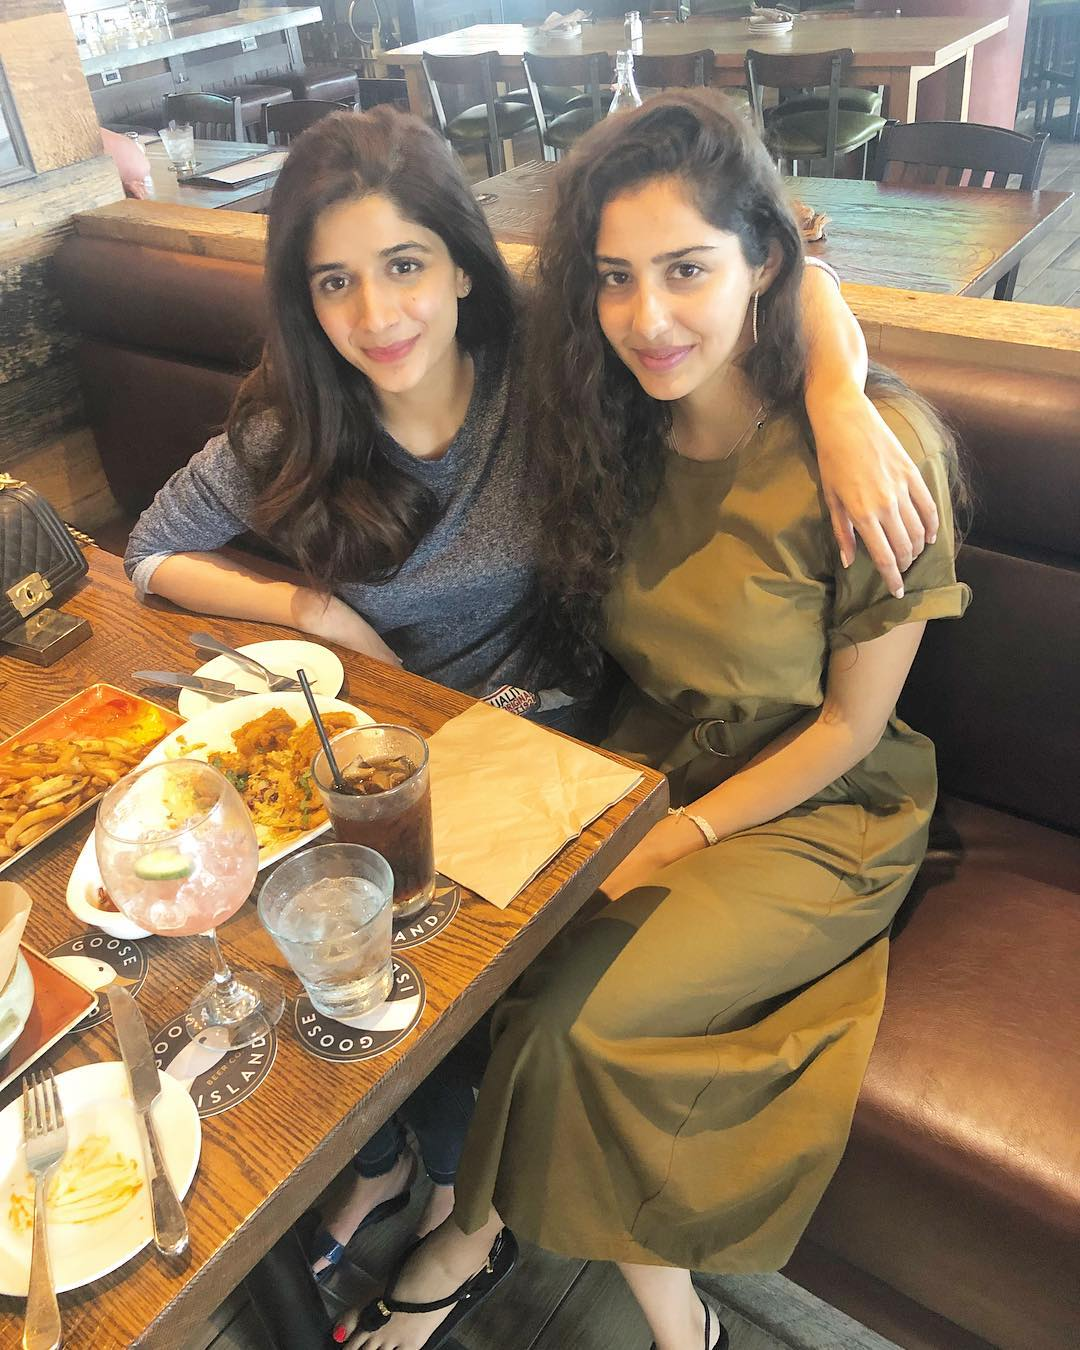 Mawra Hocane with her friend